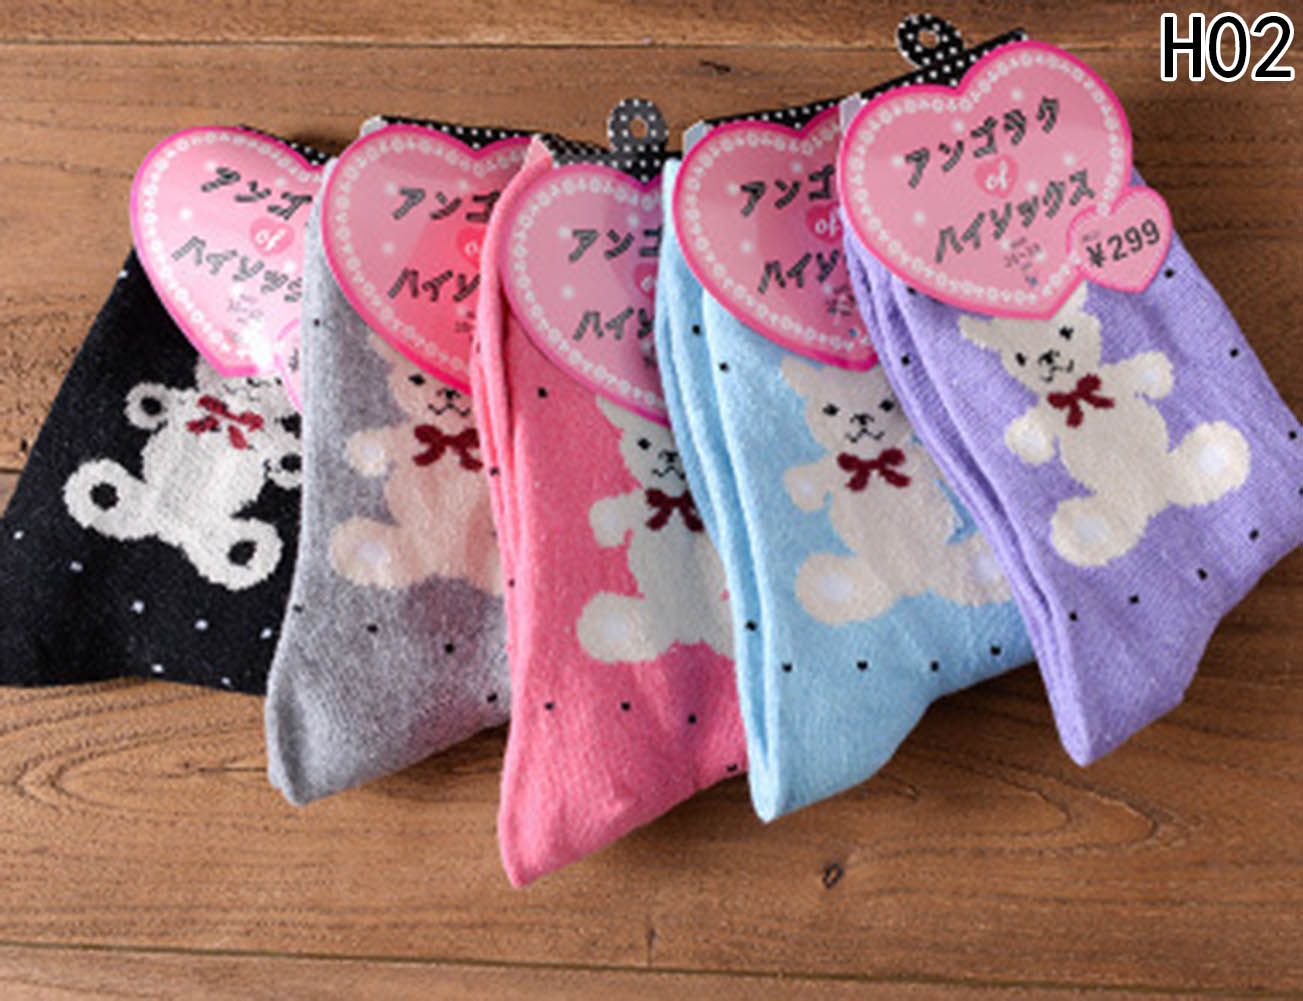 1 pair Cartoon Cat Anime Color Sock Women 2018 Christmas Warm Rabbit Fur Casual Female Ankle Socken Bear Funny Happy Sox Soks in Socks from Women's